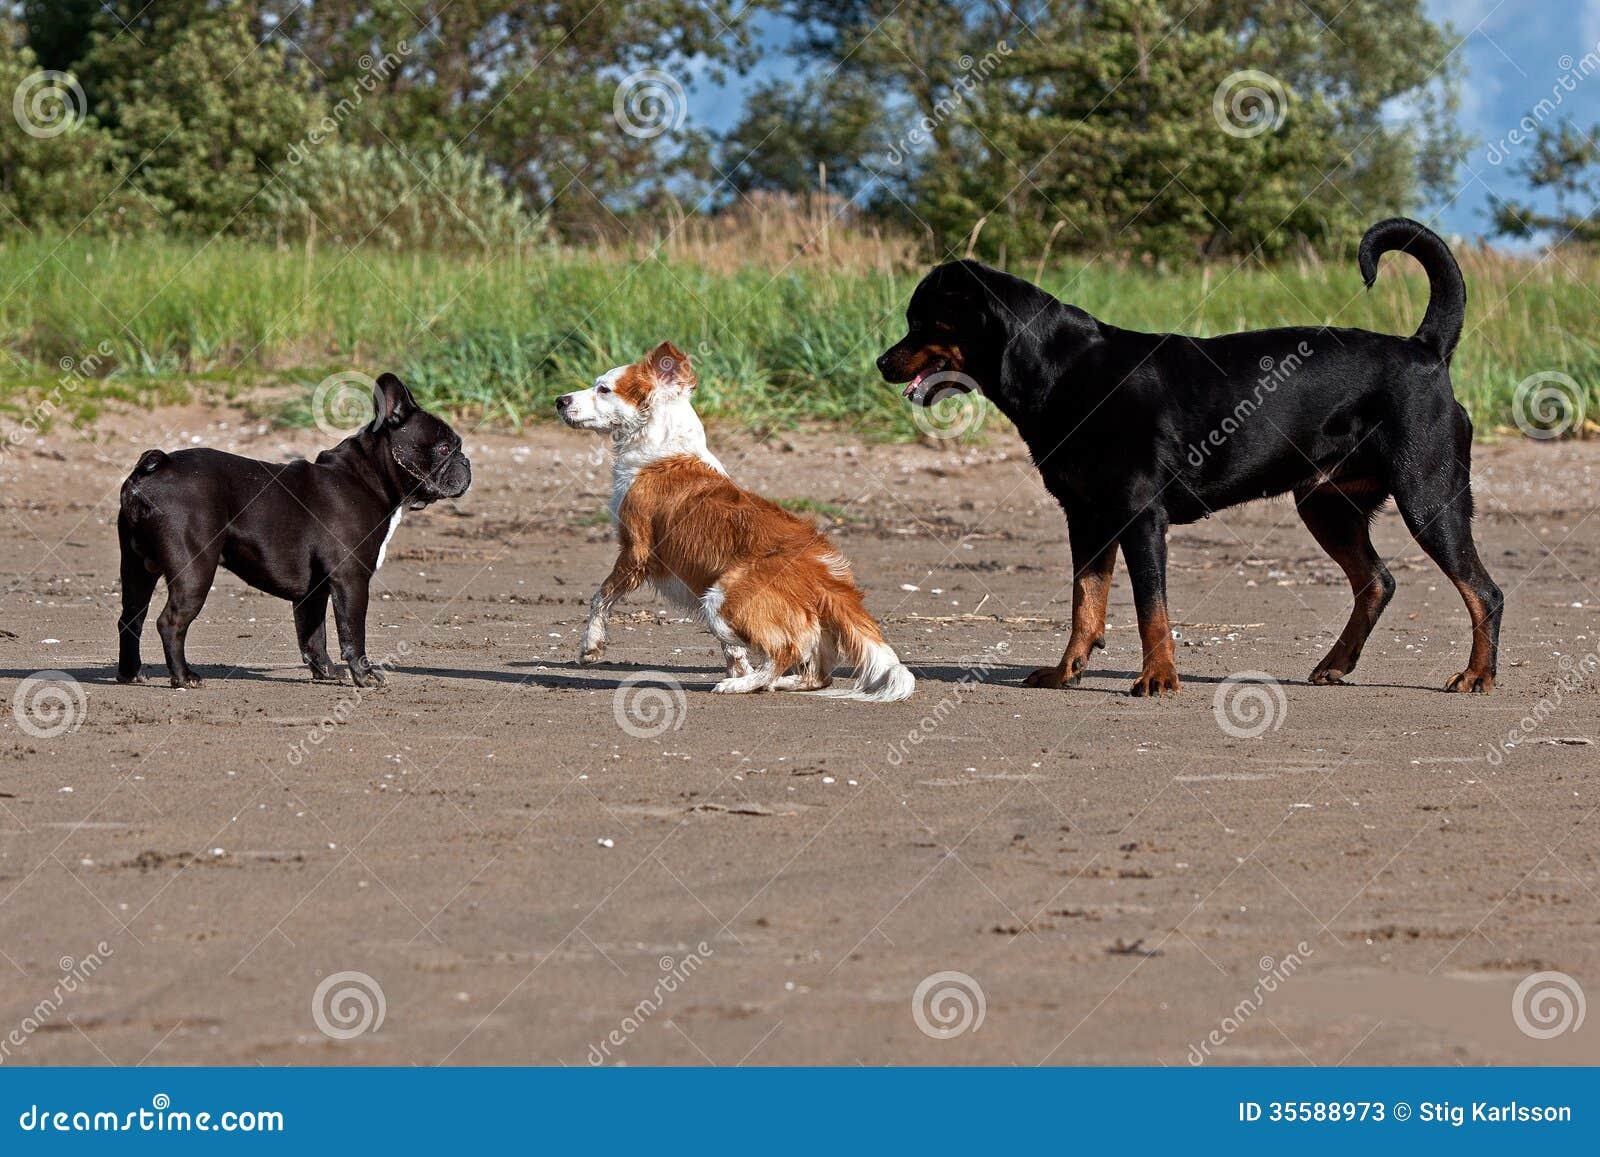 English Bulldog Rottweiler Mix Franch bulldog, rottweiler